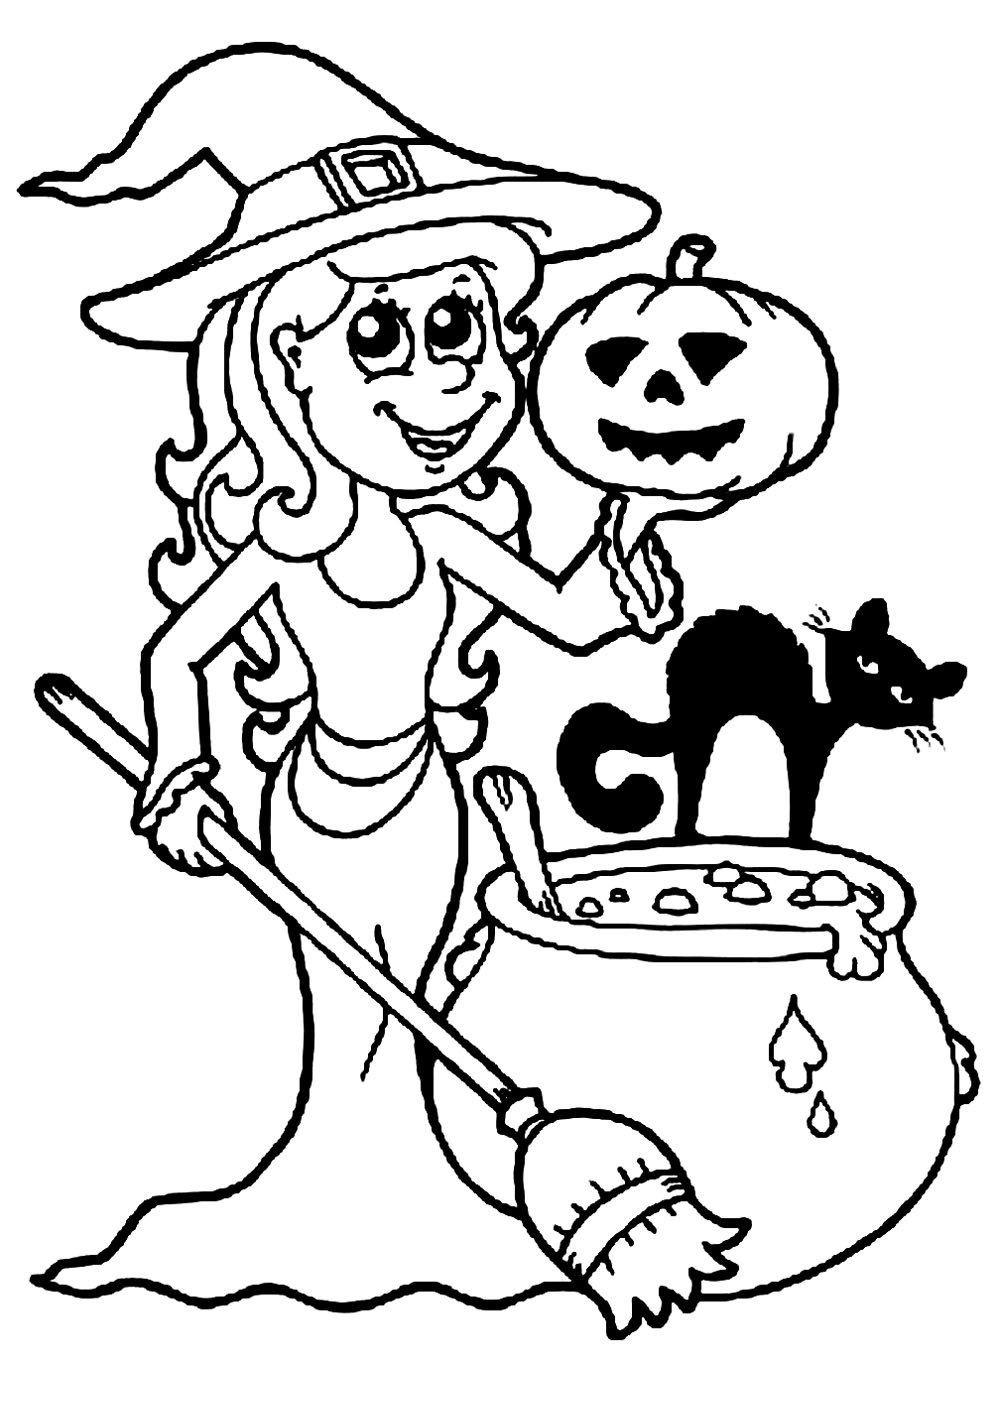 Halloween Coloring Worksheets for Preschoolers Halloween Free to